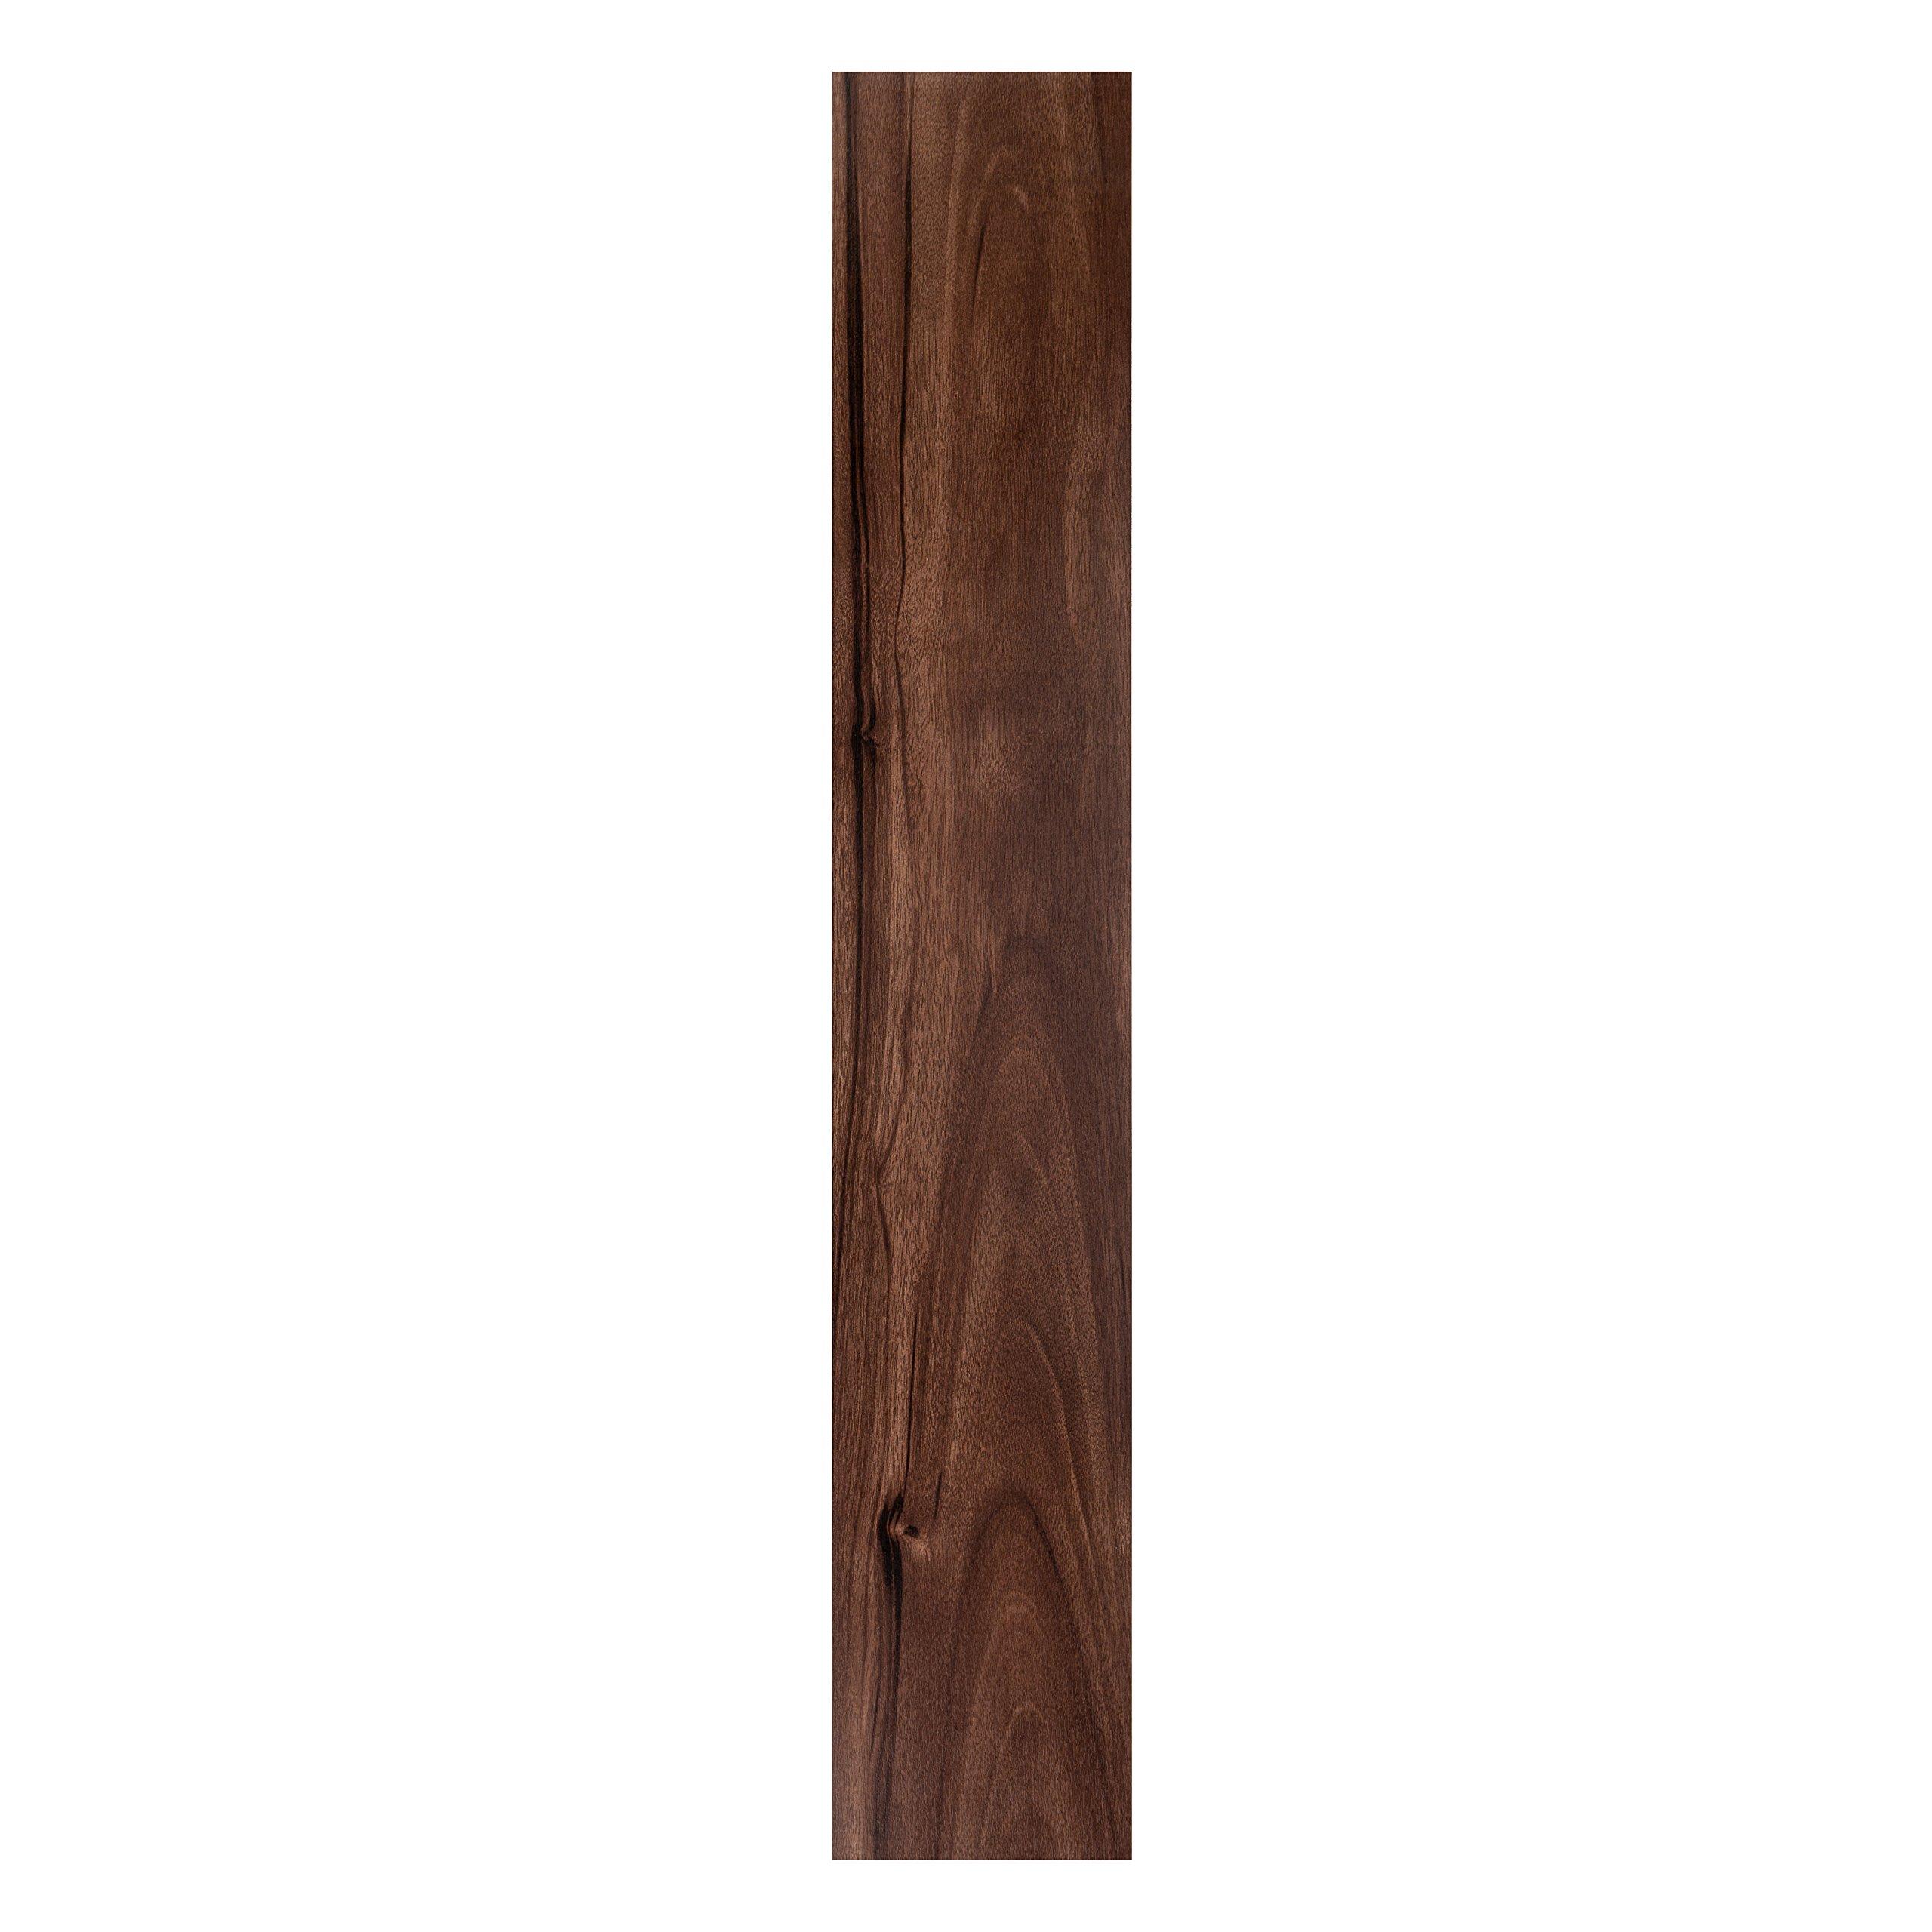 Achim Imports VFP1.2HK10 Nexus Hickory 6x36 Self Adhesive Vinyl Floor Planks-10 Planks/15 sq ft, Piece